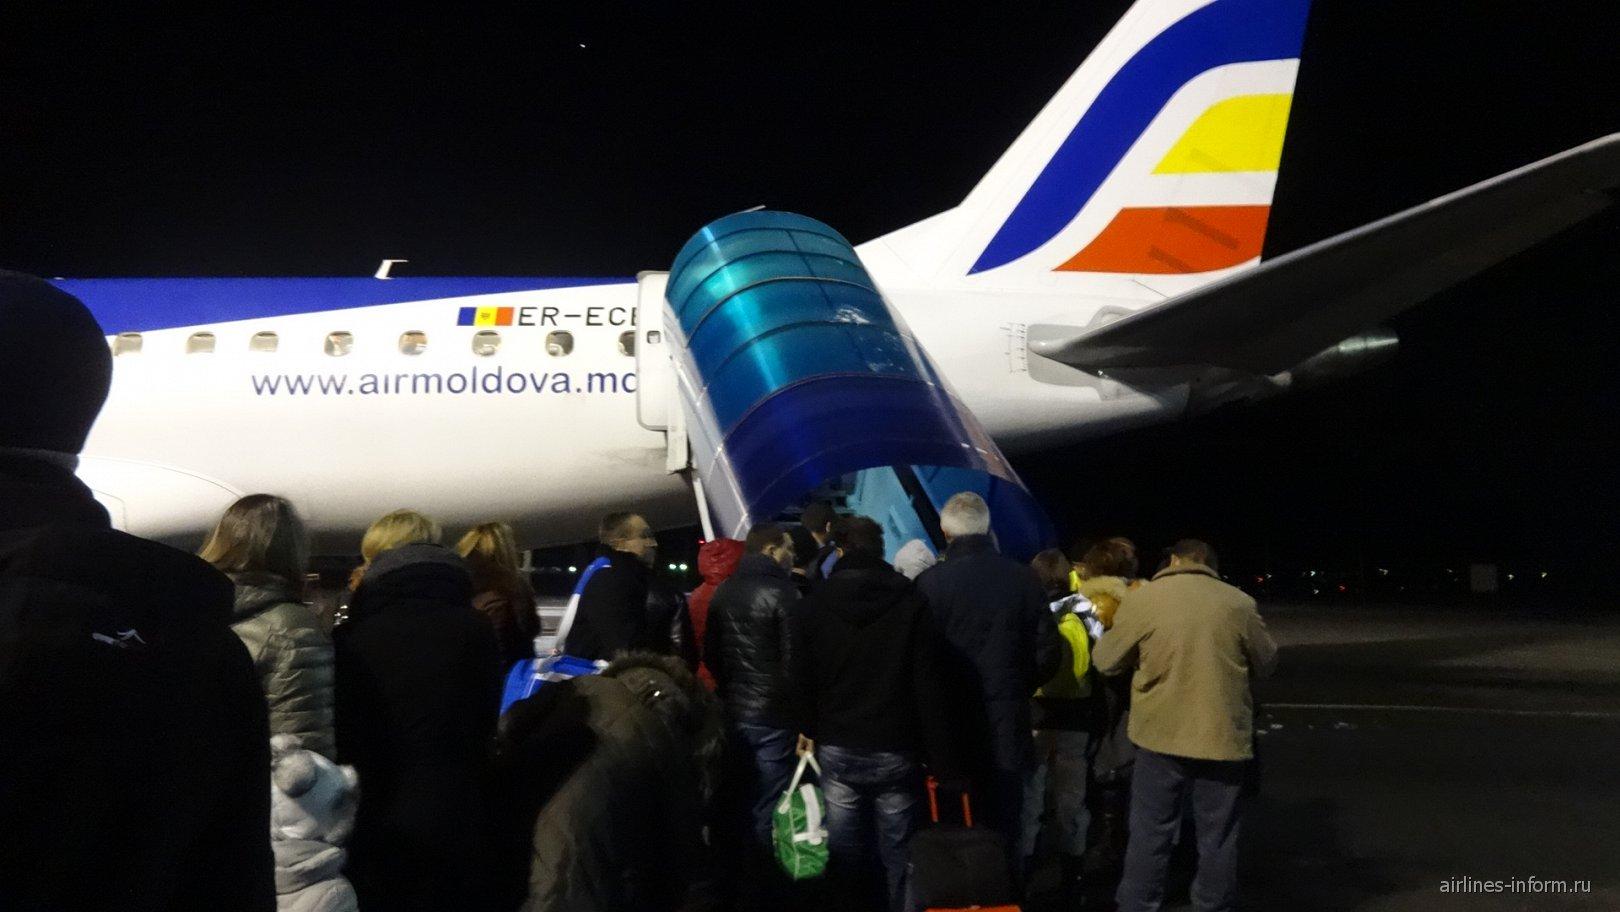 Самолет Embraer 190 авиакомпании Air Moldova